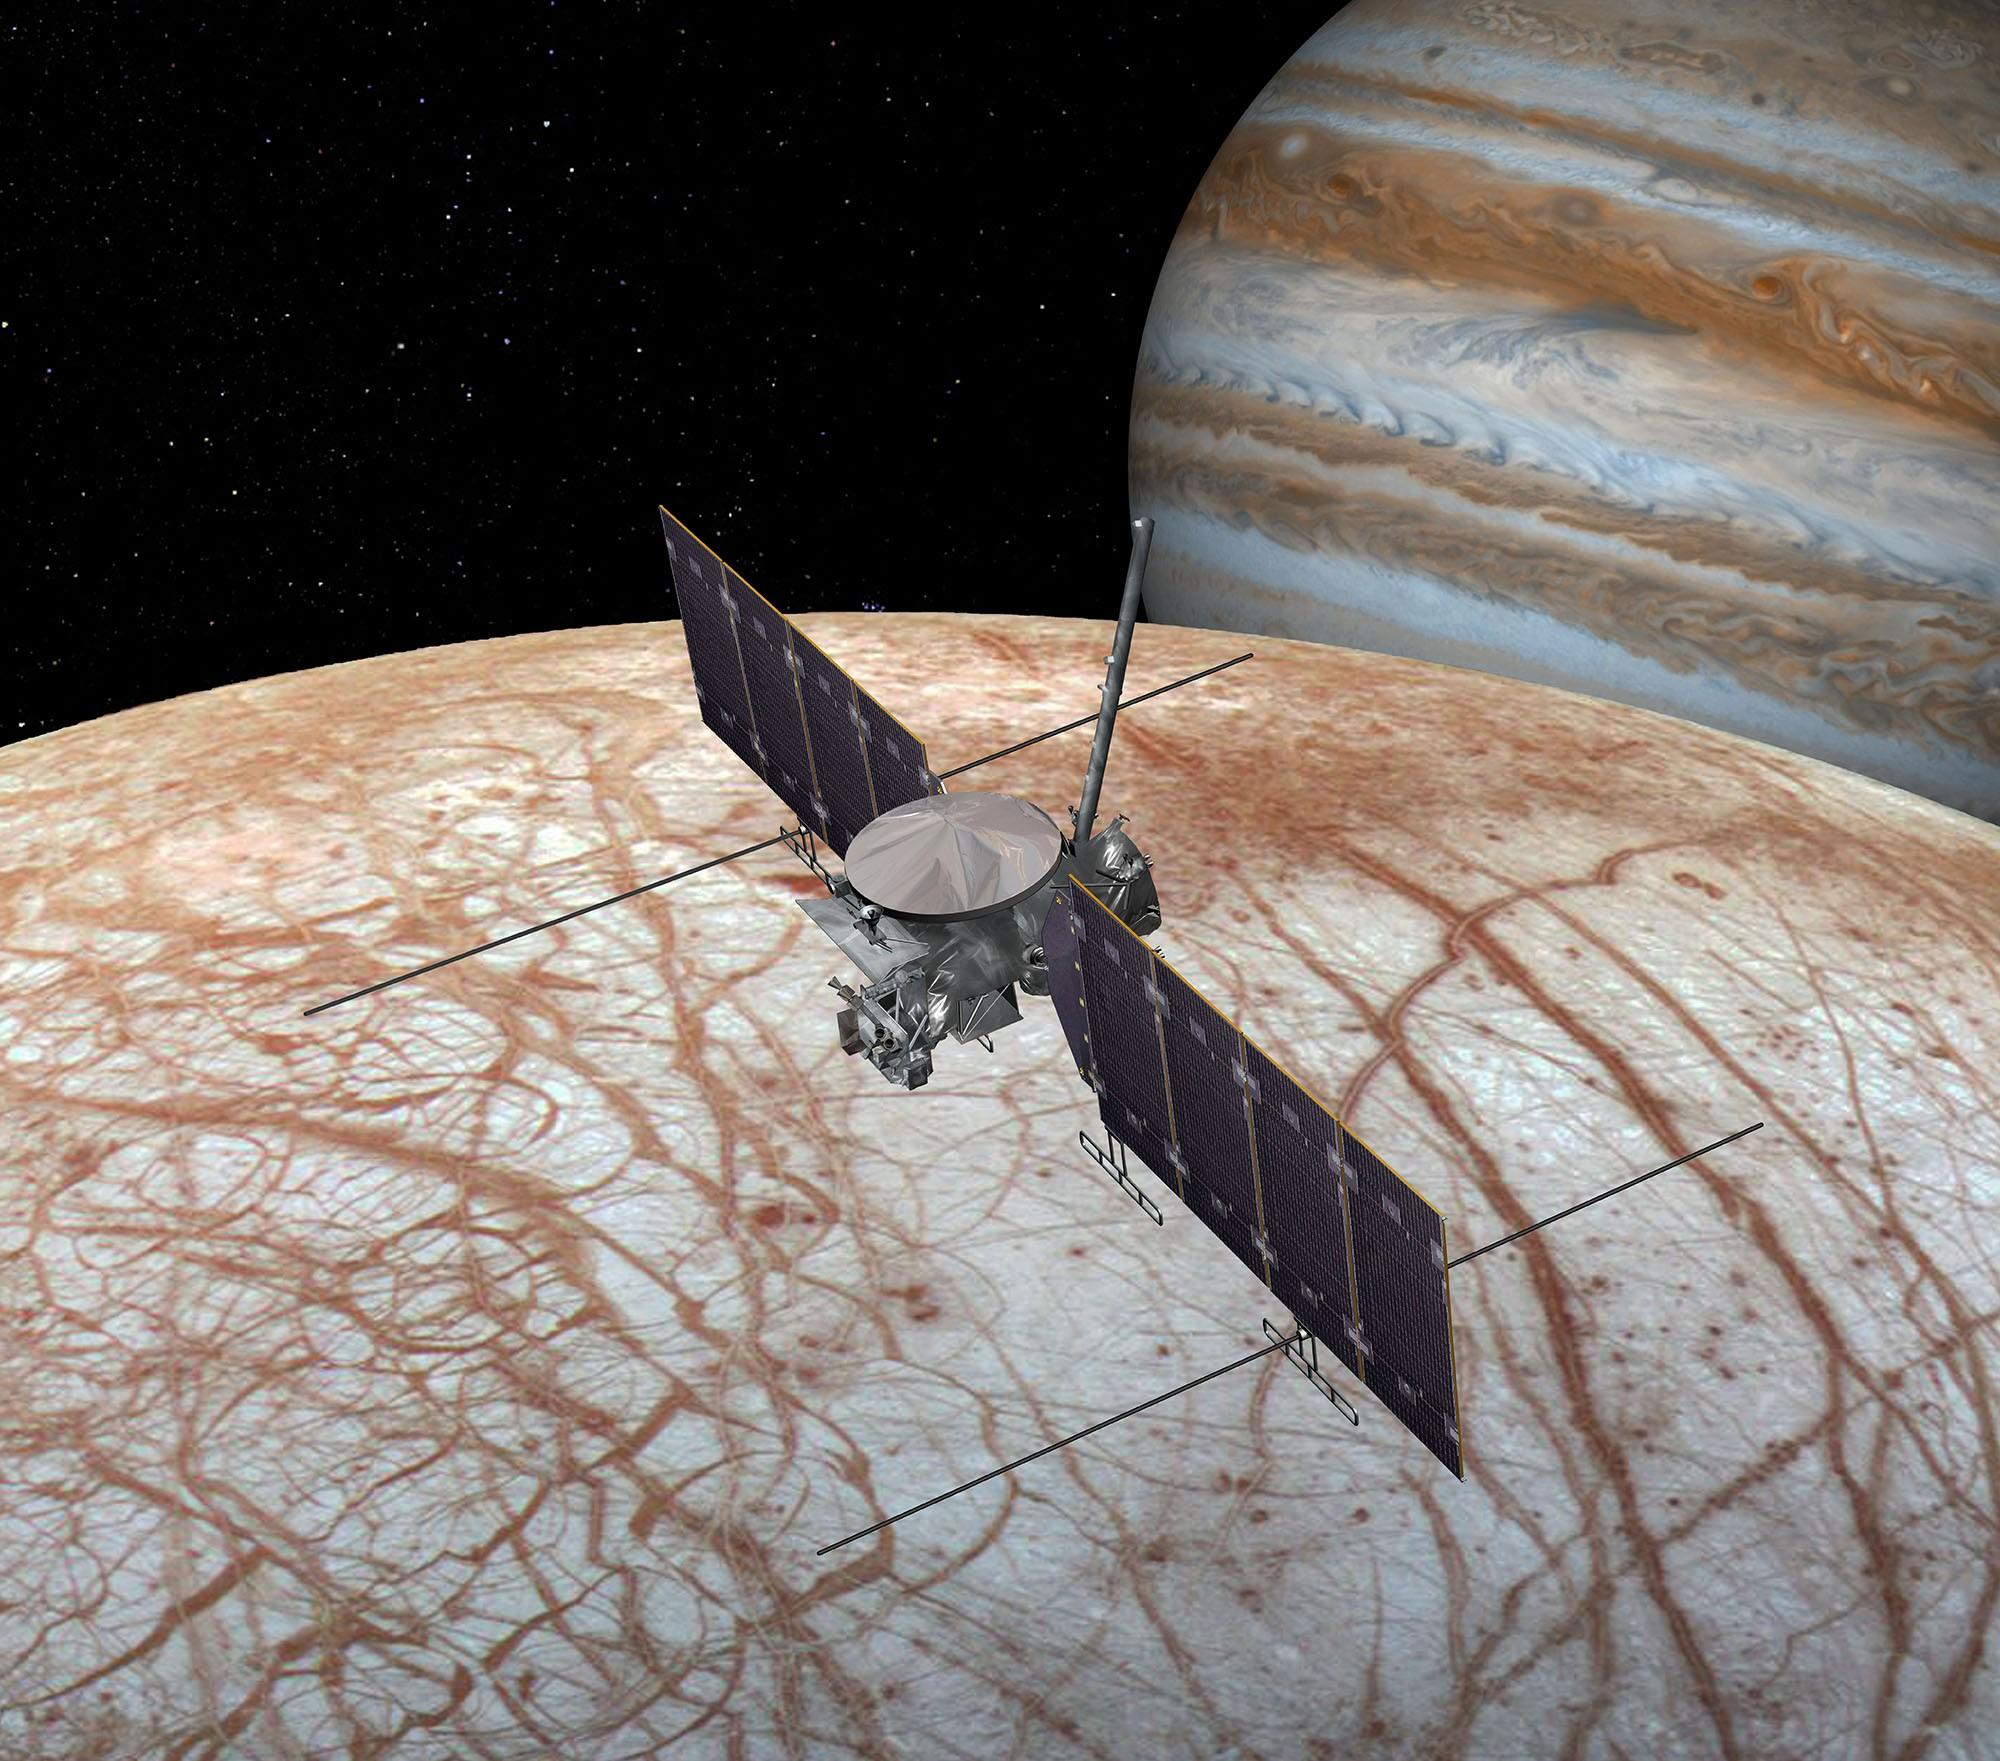 An artist's impression of the Europa Clipper exploring Jupiter's moon Enceladus.Credit: NASA/JPL-Caltech